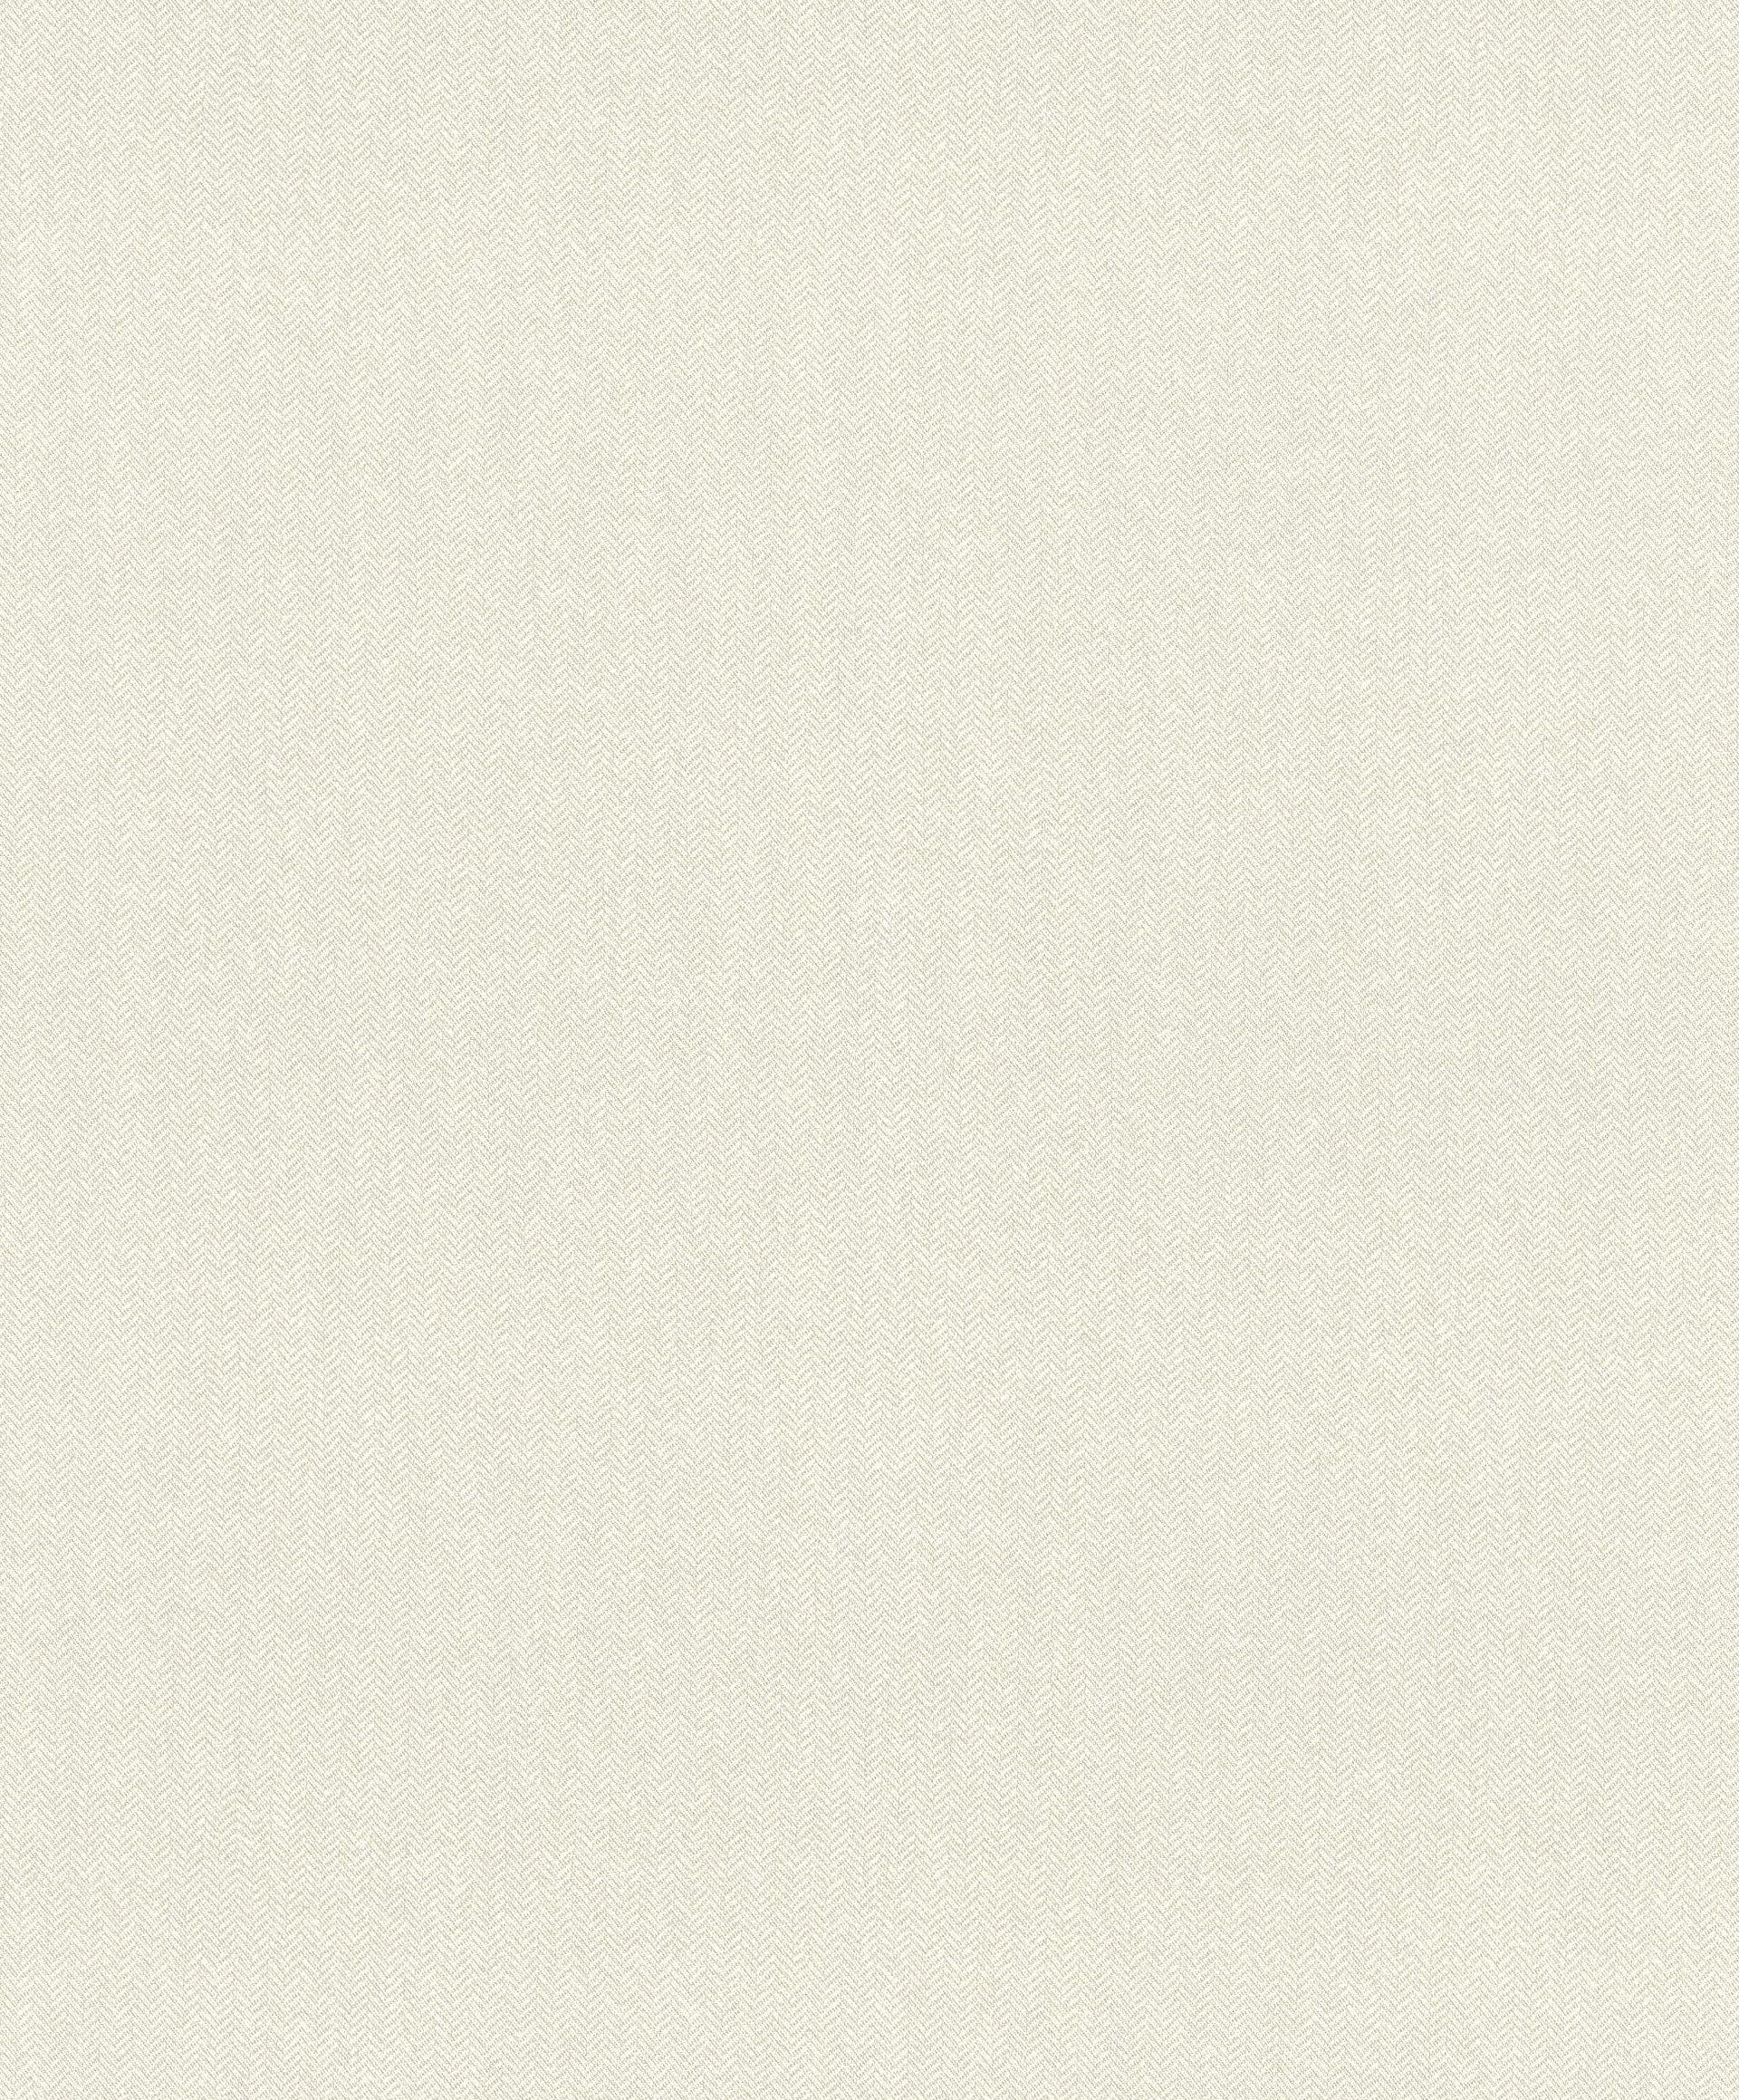 Papel de Parede Barbara Home Collection 860221 - Rolo: 10m x 0,53m